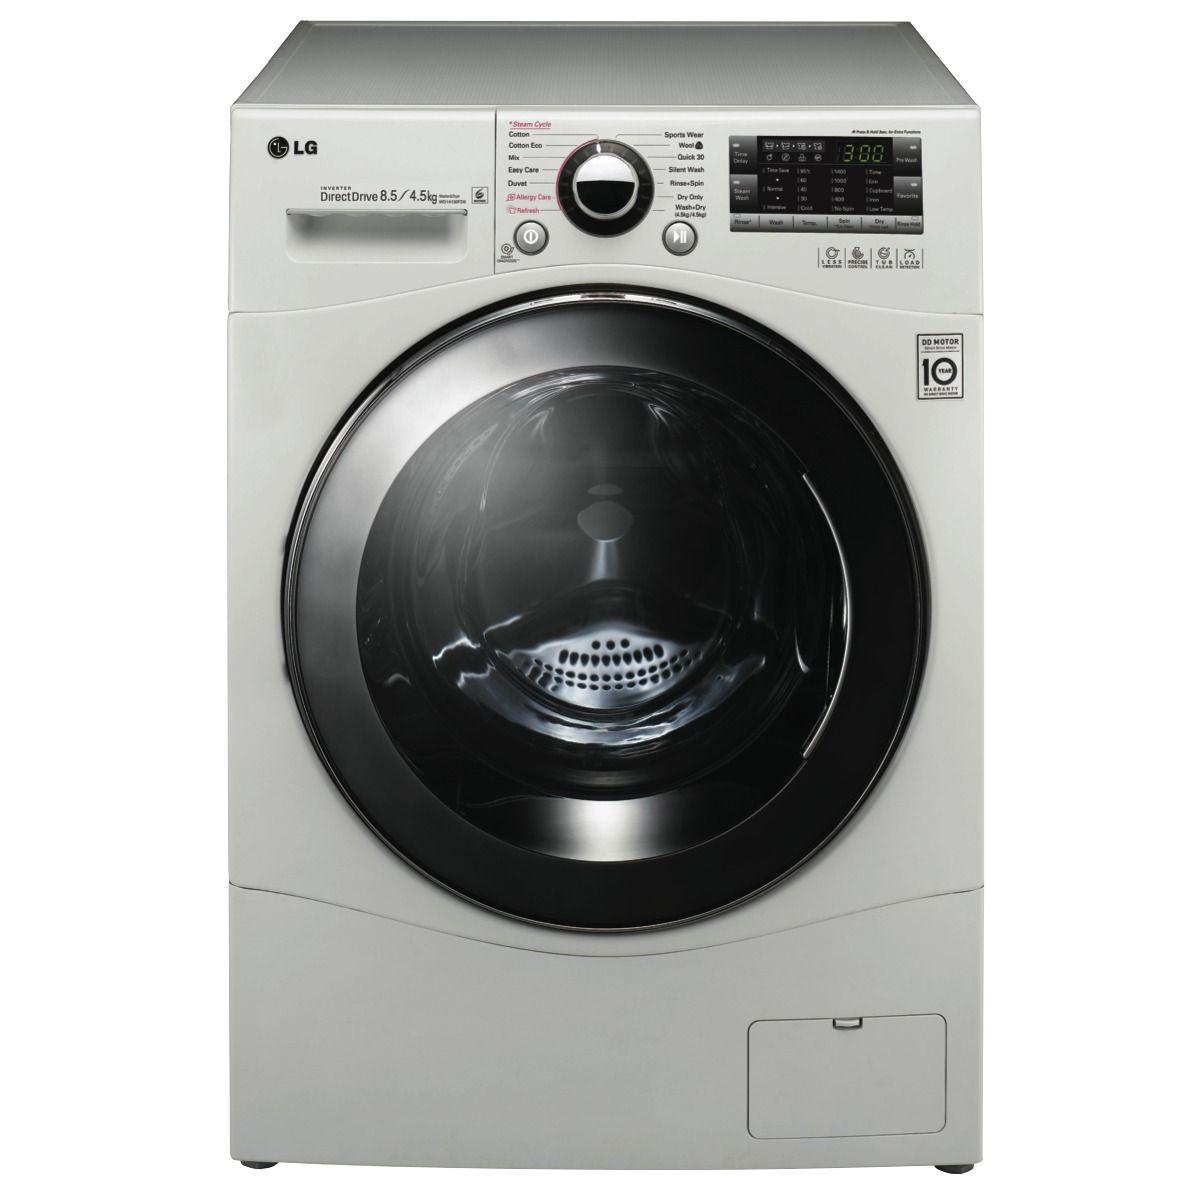 Lg Wd14130fd6 8 5kg Washer 4 5kg Dryer Combo At The Good Guys Washing Machine Front Loading Washing Machine Washing Machine Lg